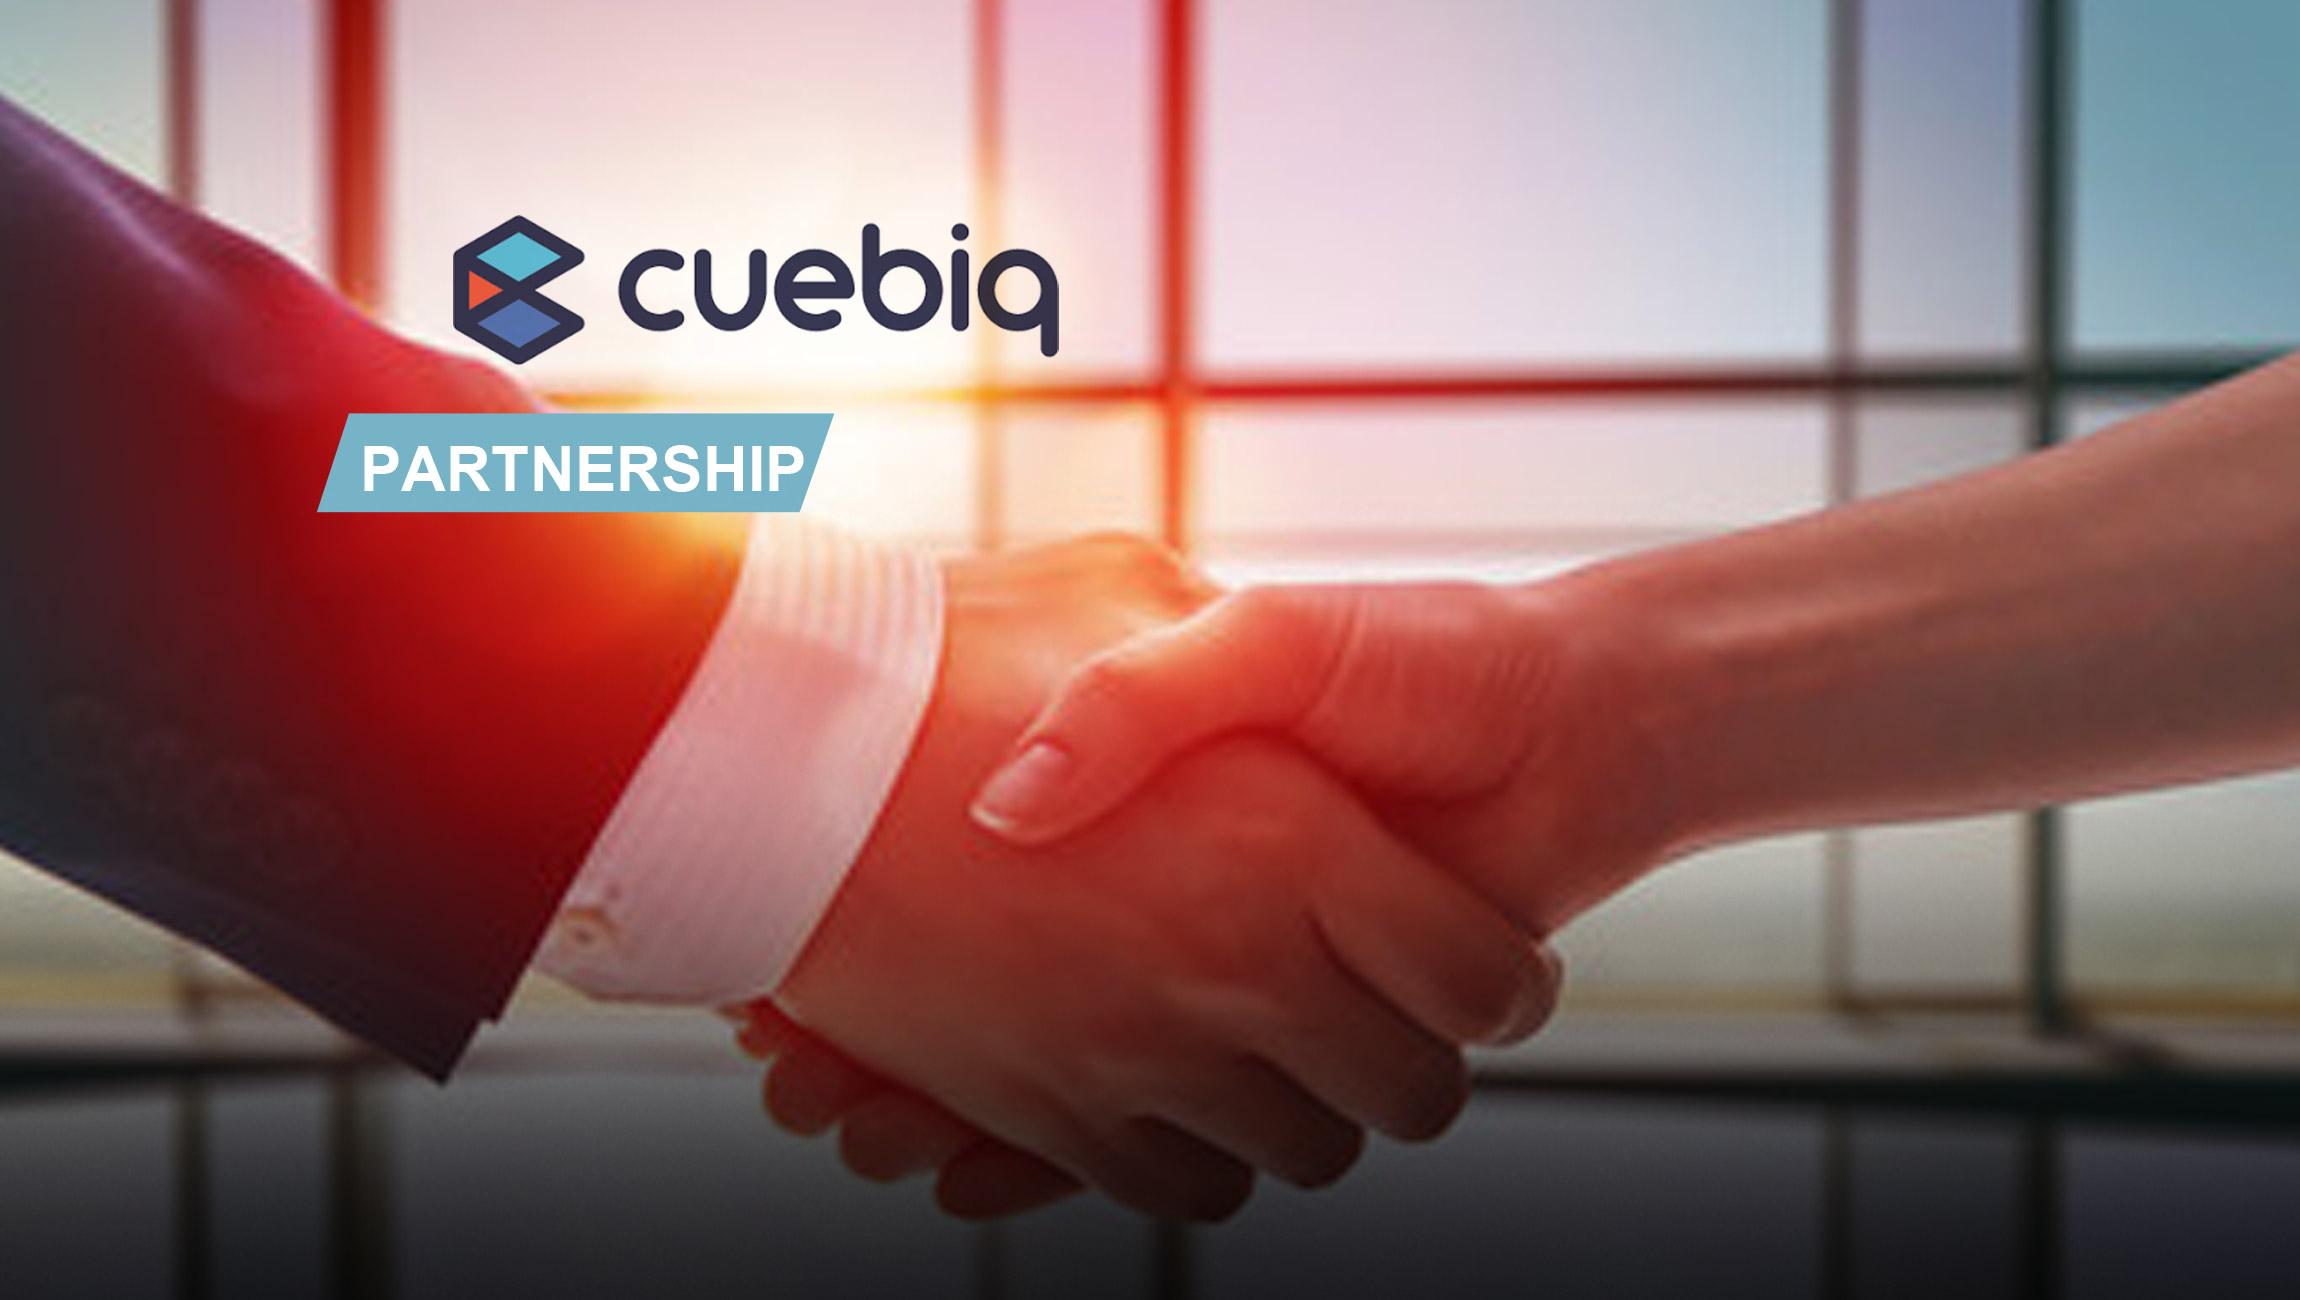 Astraea Announces Partnership With Cuebiq